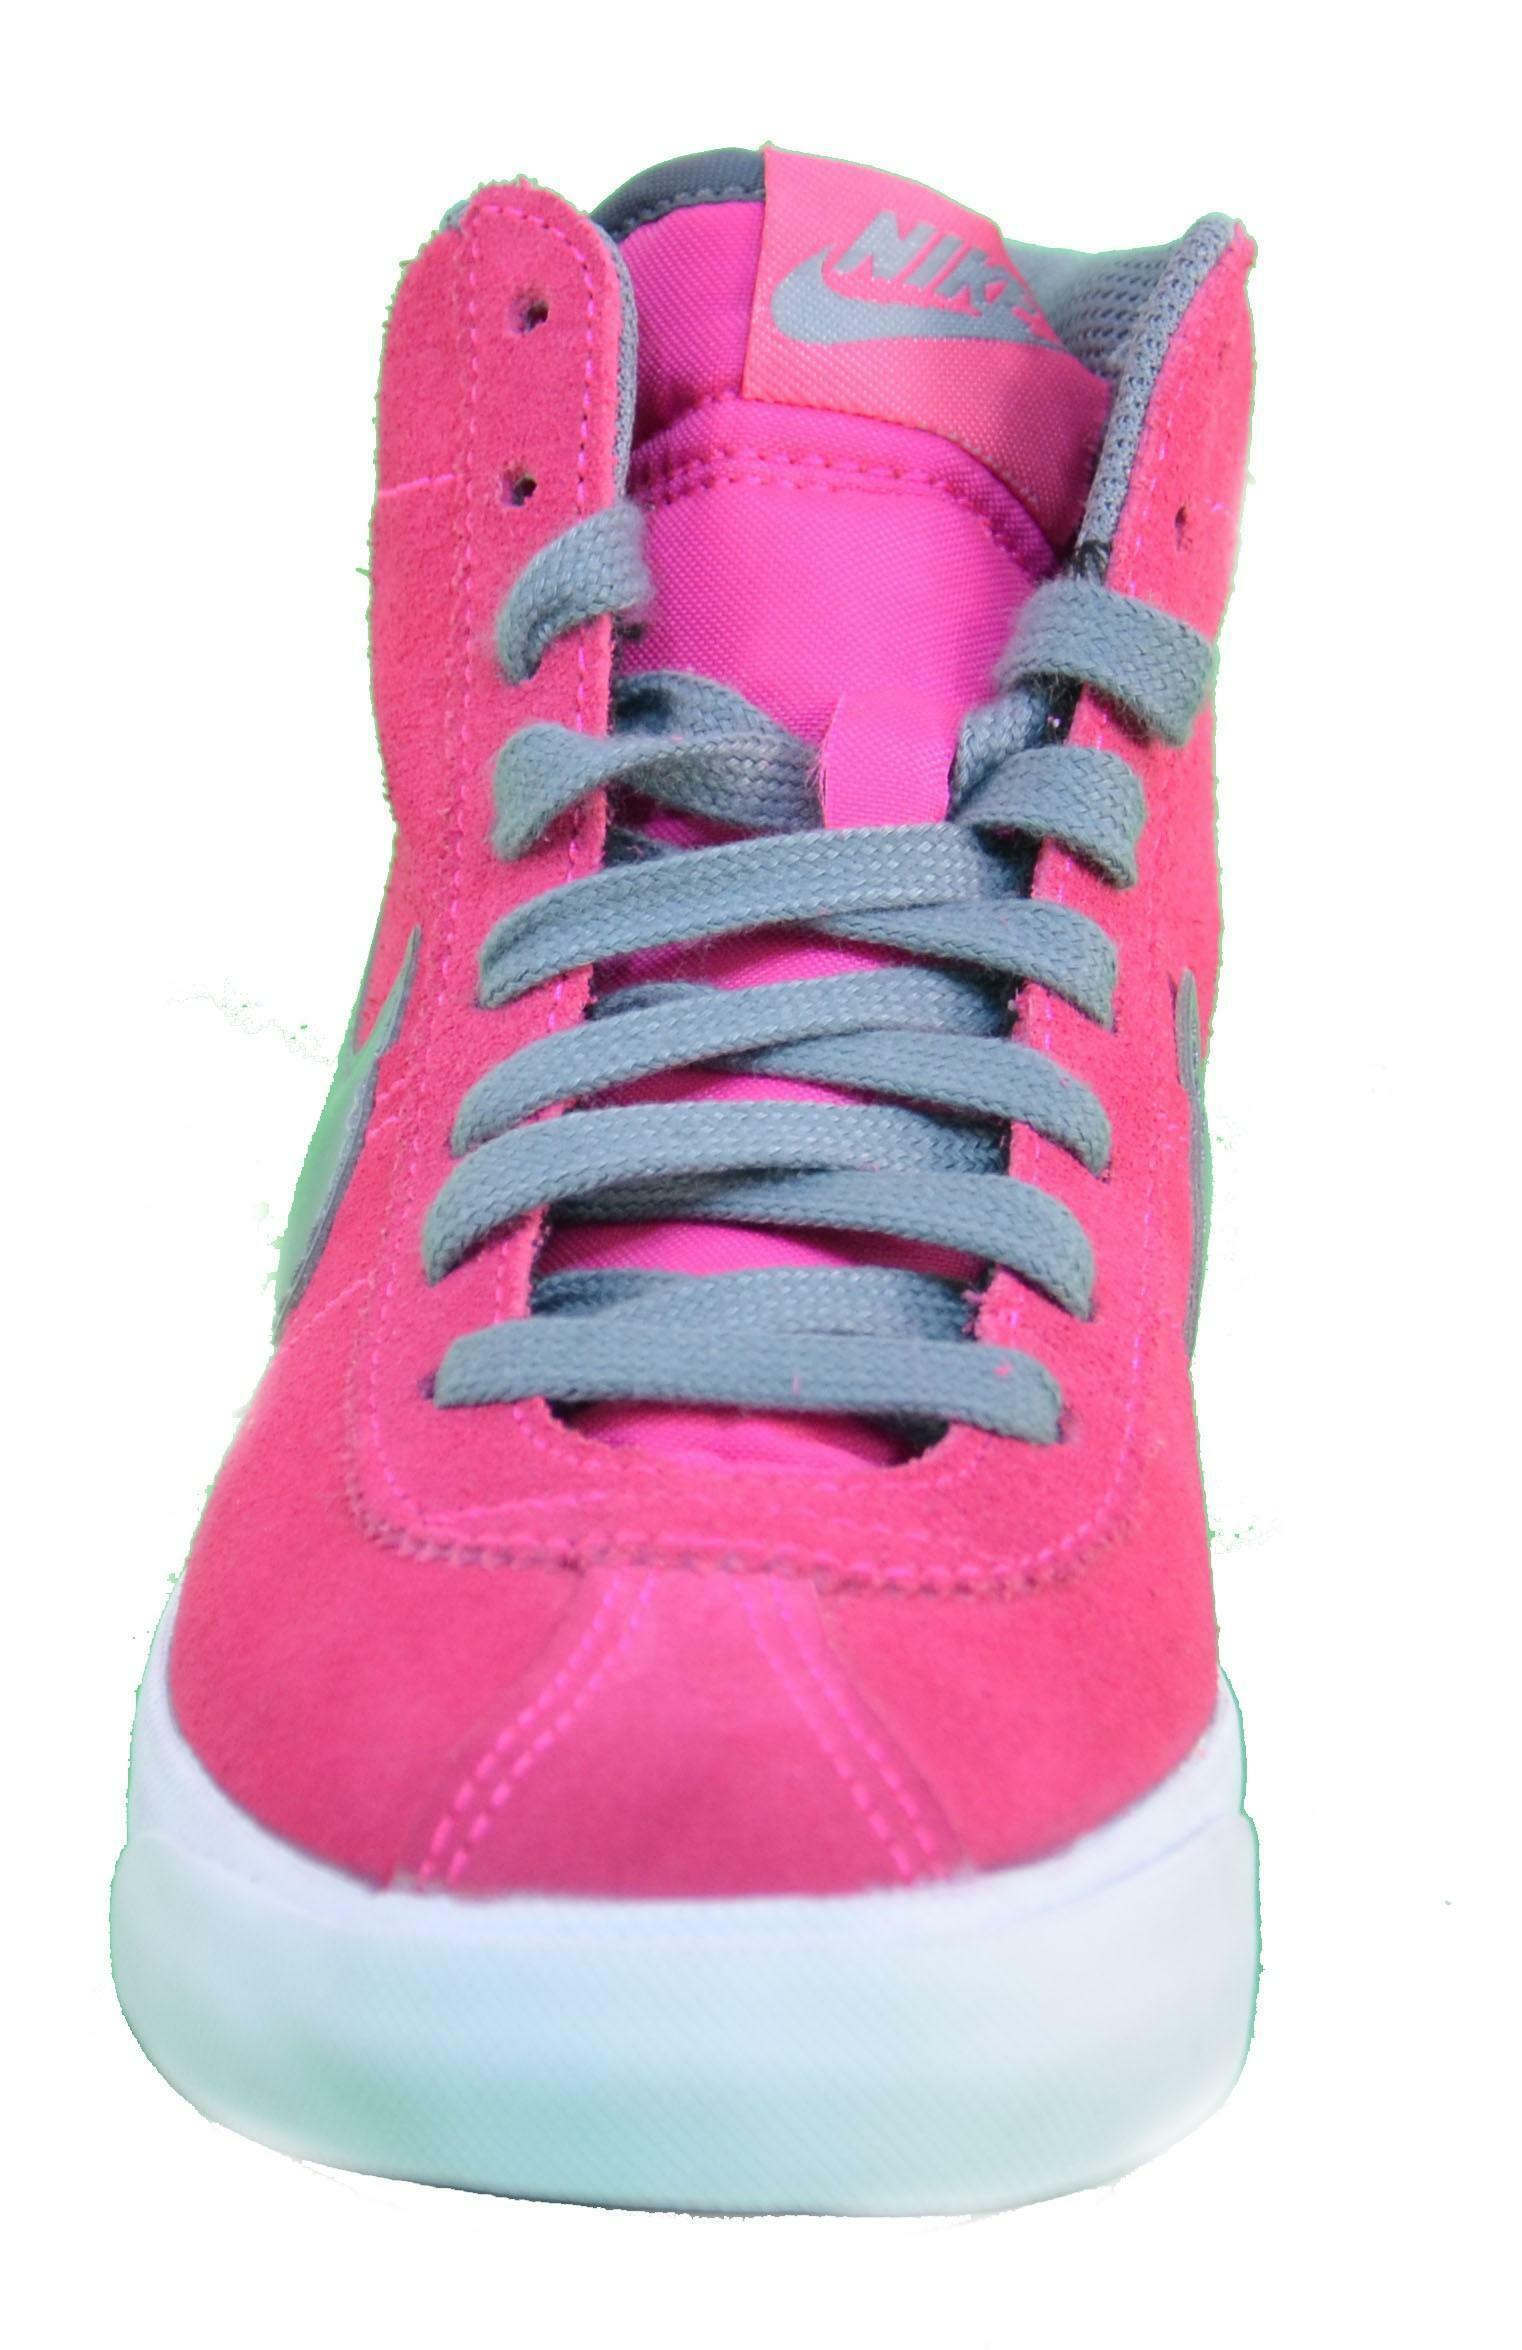 nike bruin mid (gs) scarpe donna rosa pelle 577864